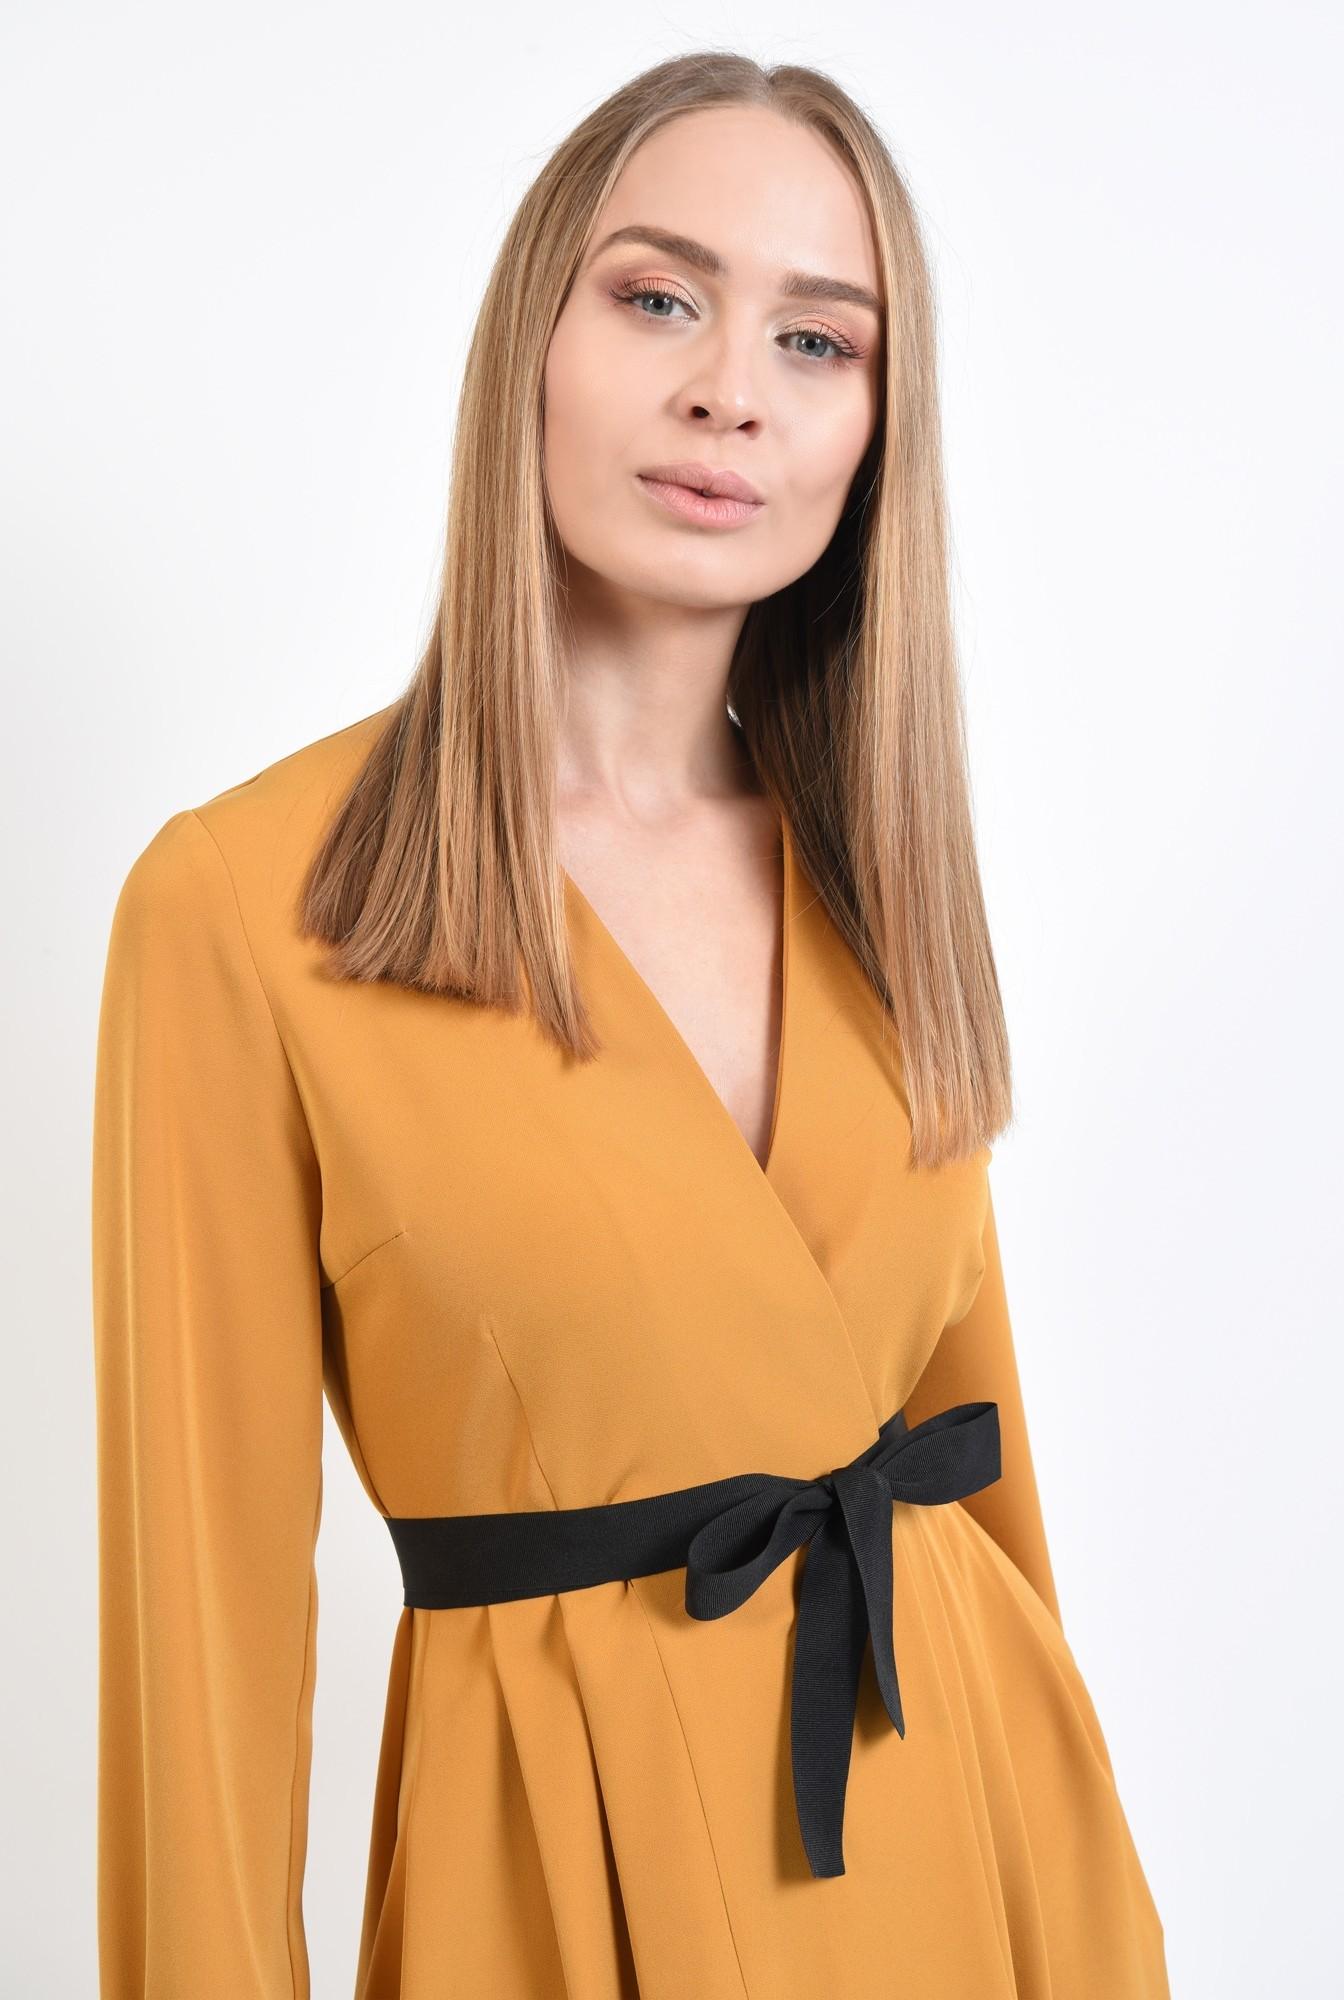 2 - rochie mustar, anchior petrecut, maneci lungi cu manseta, croi parte peste parte